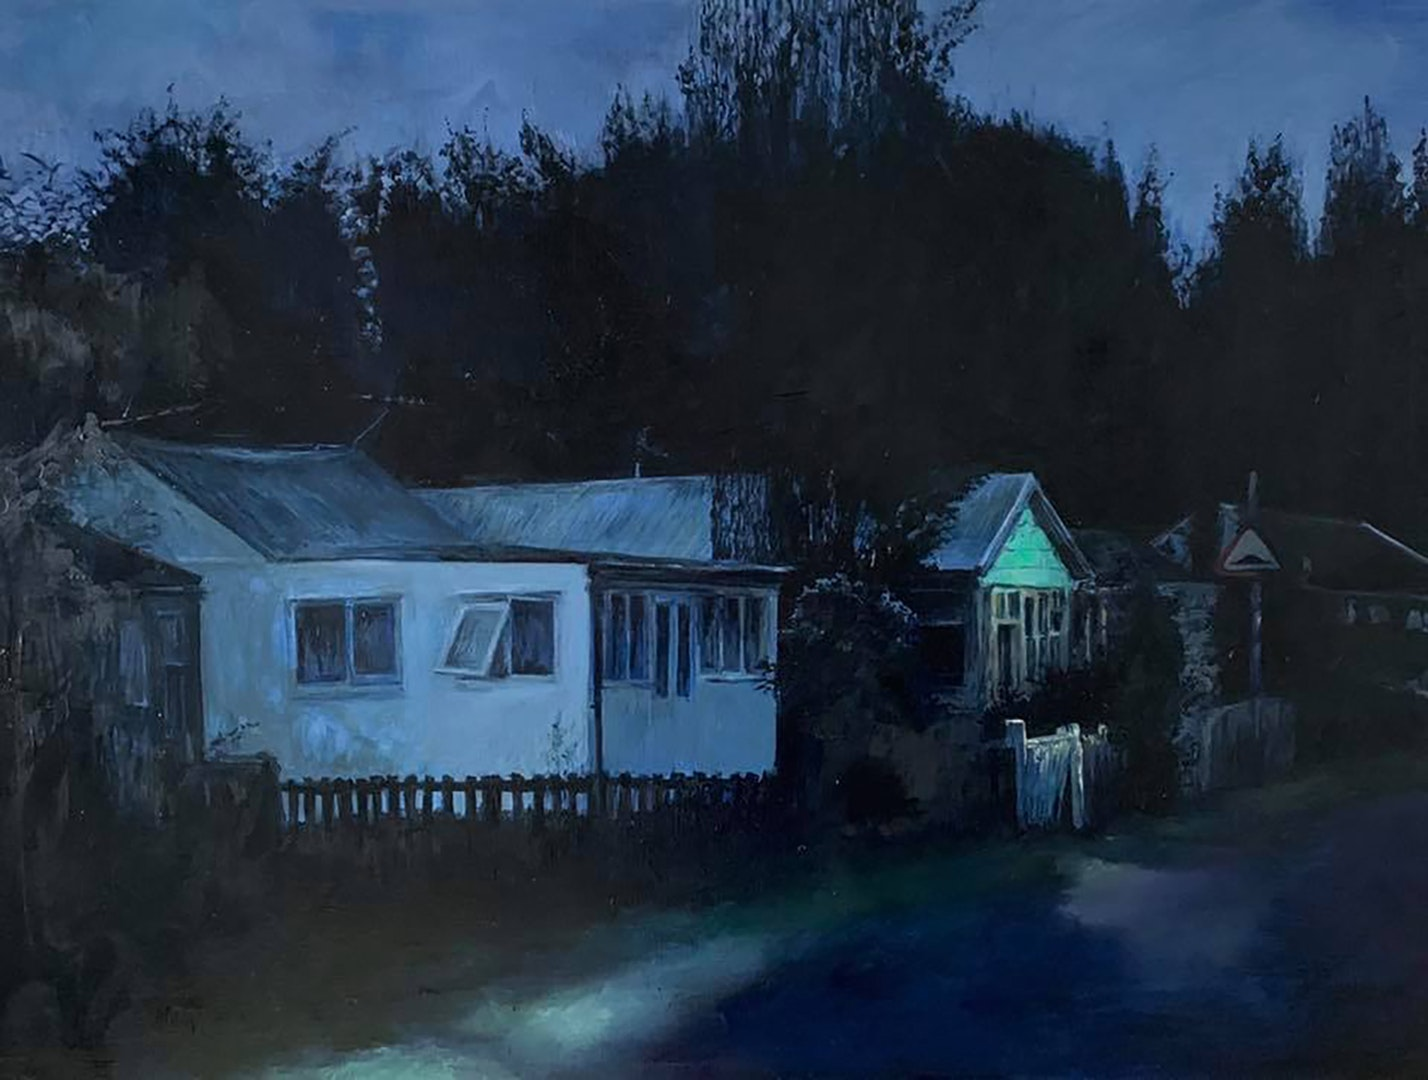 'Do not park on the grass verge', Judith Tucker, Oil on linen, 60 x 80 x 4 cm